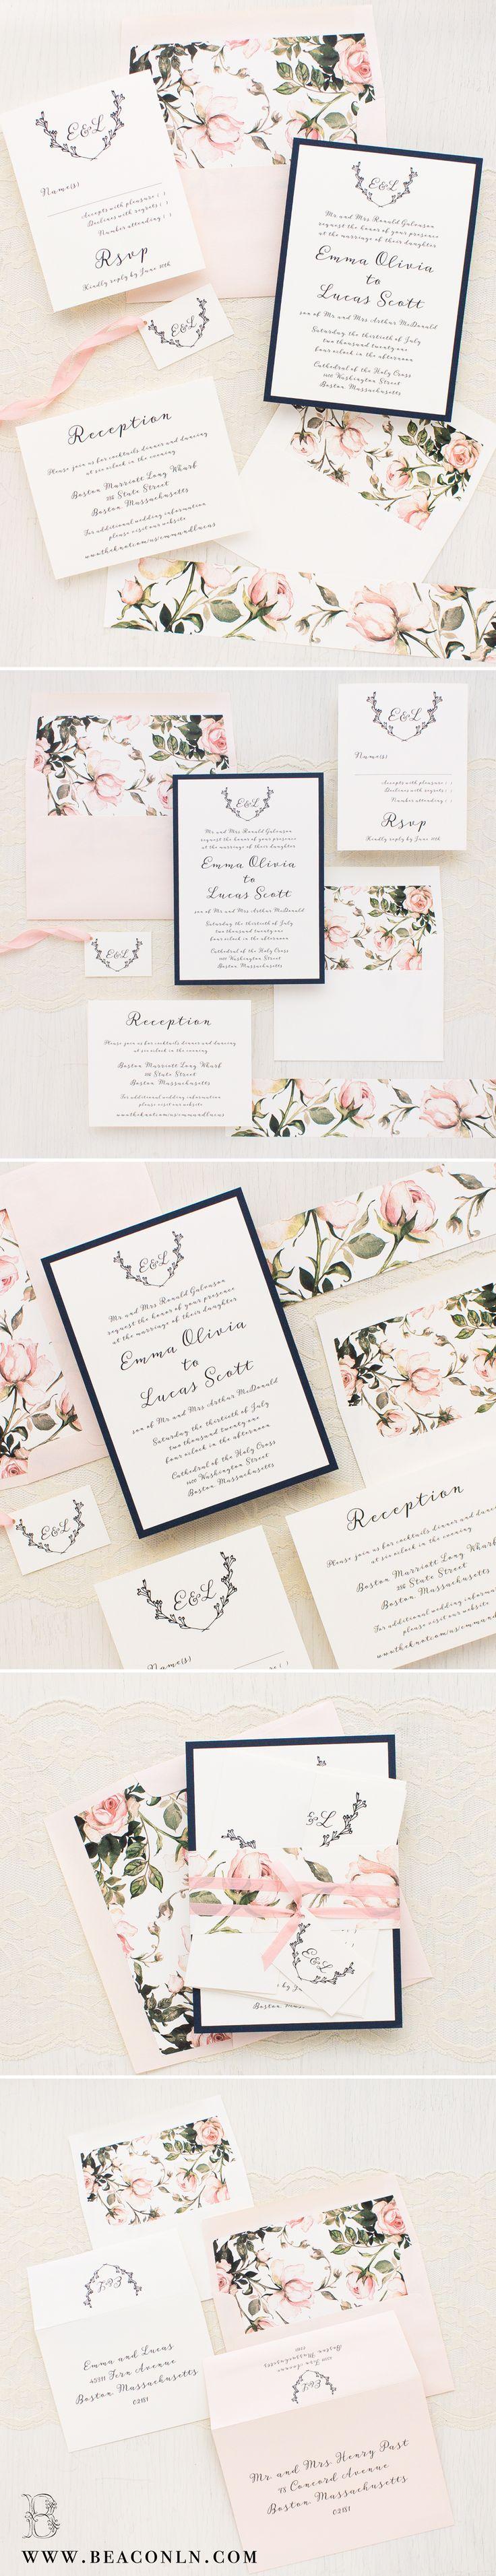 Wedding decorations queenstown october 2018  best I do images on Pinterest  Wedding dressses Dreams and